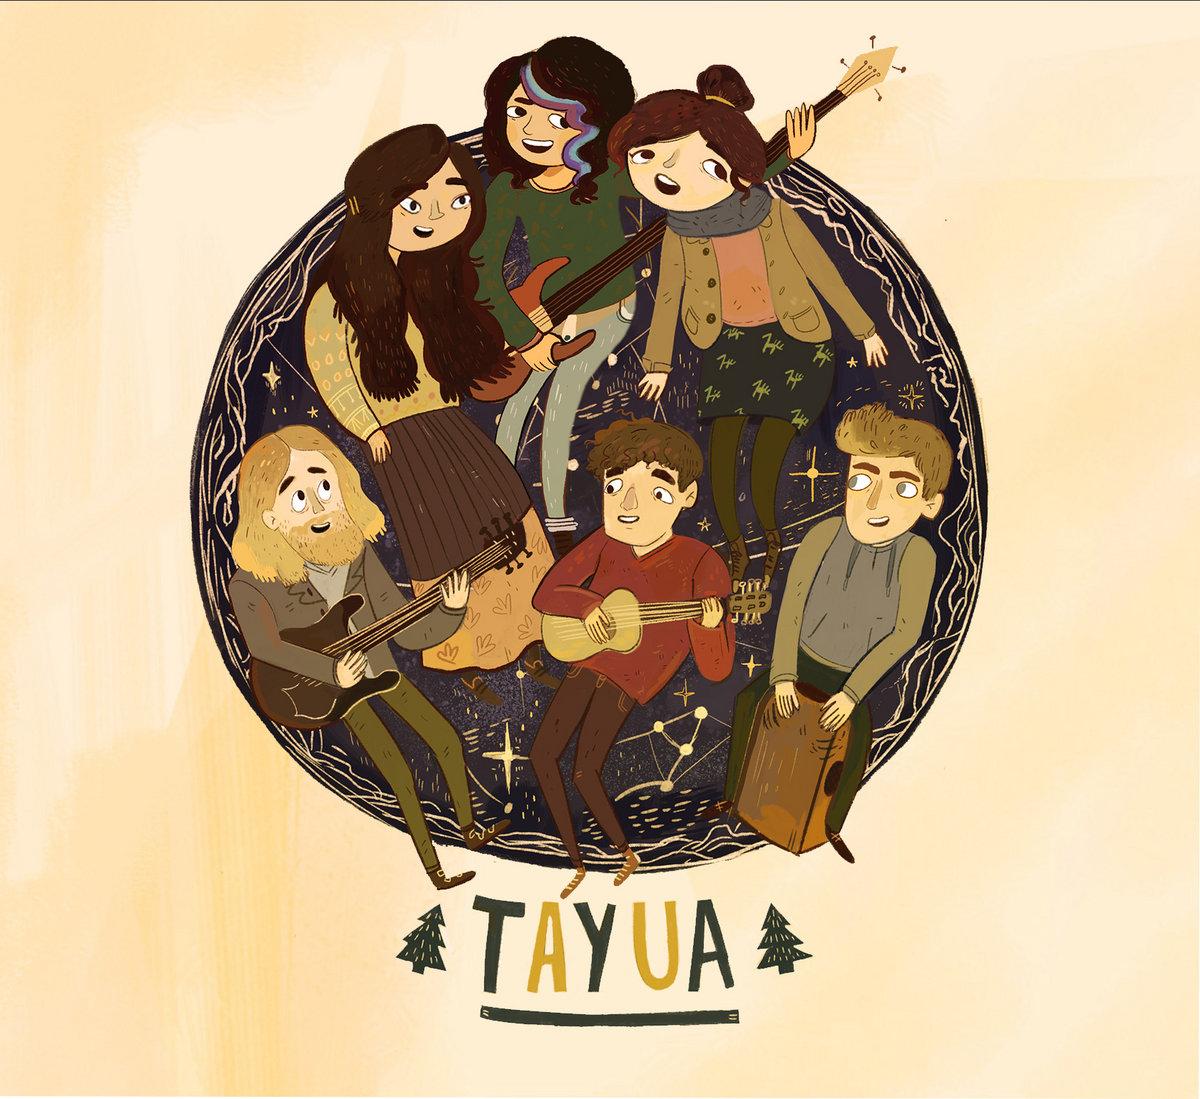 El Tamalito by Tayua